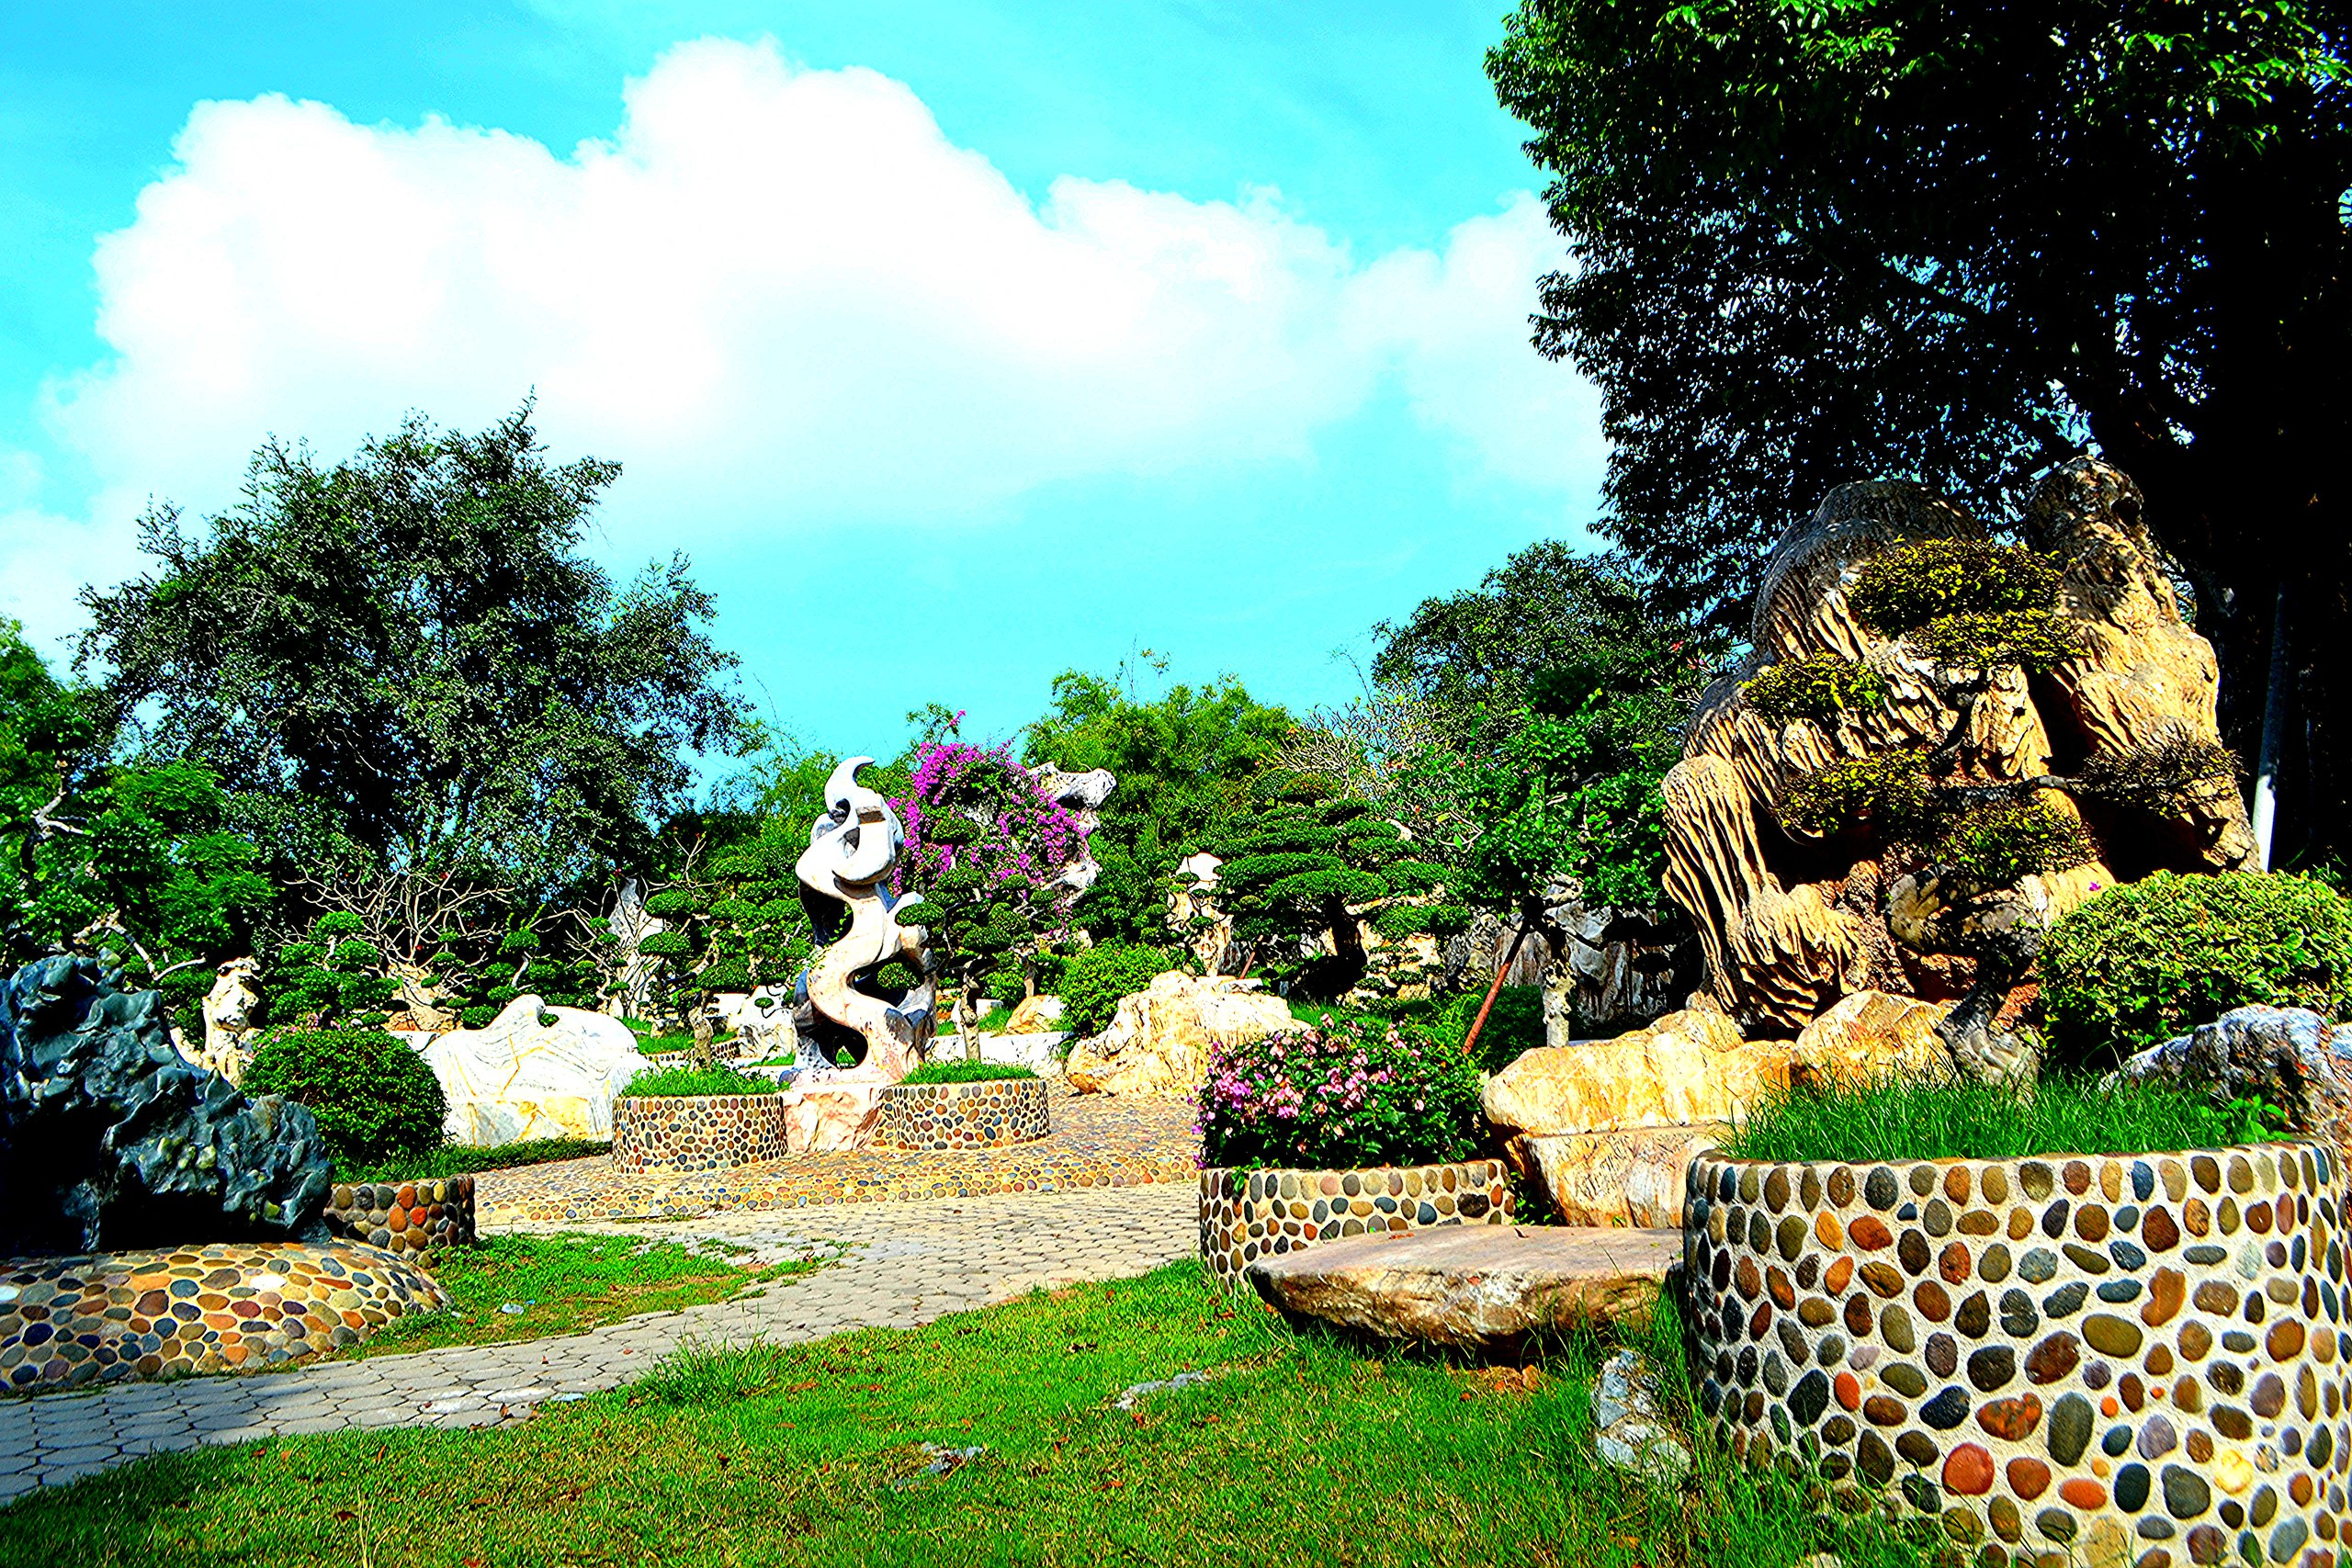 Елена Руденко ( Валтея ). Таиланд. Парк миллионолетних камней и крокодиловая ферма. 4a9W4WH8Rdk